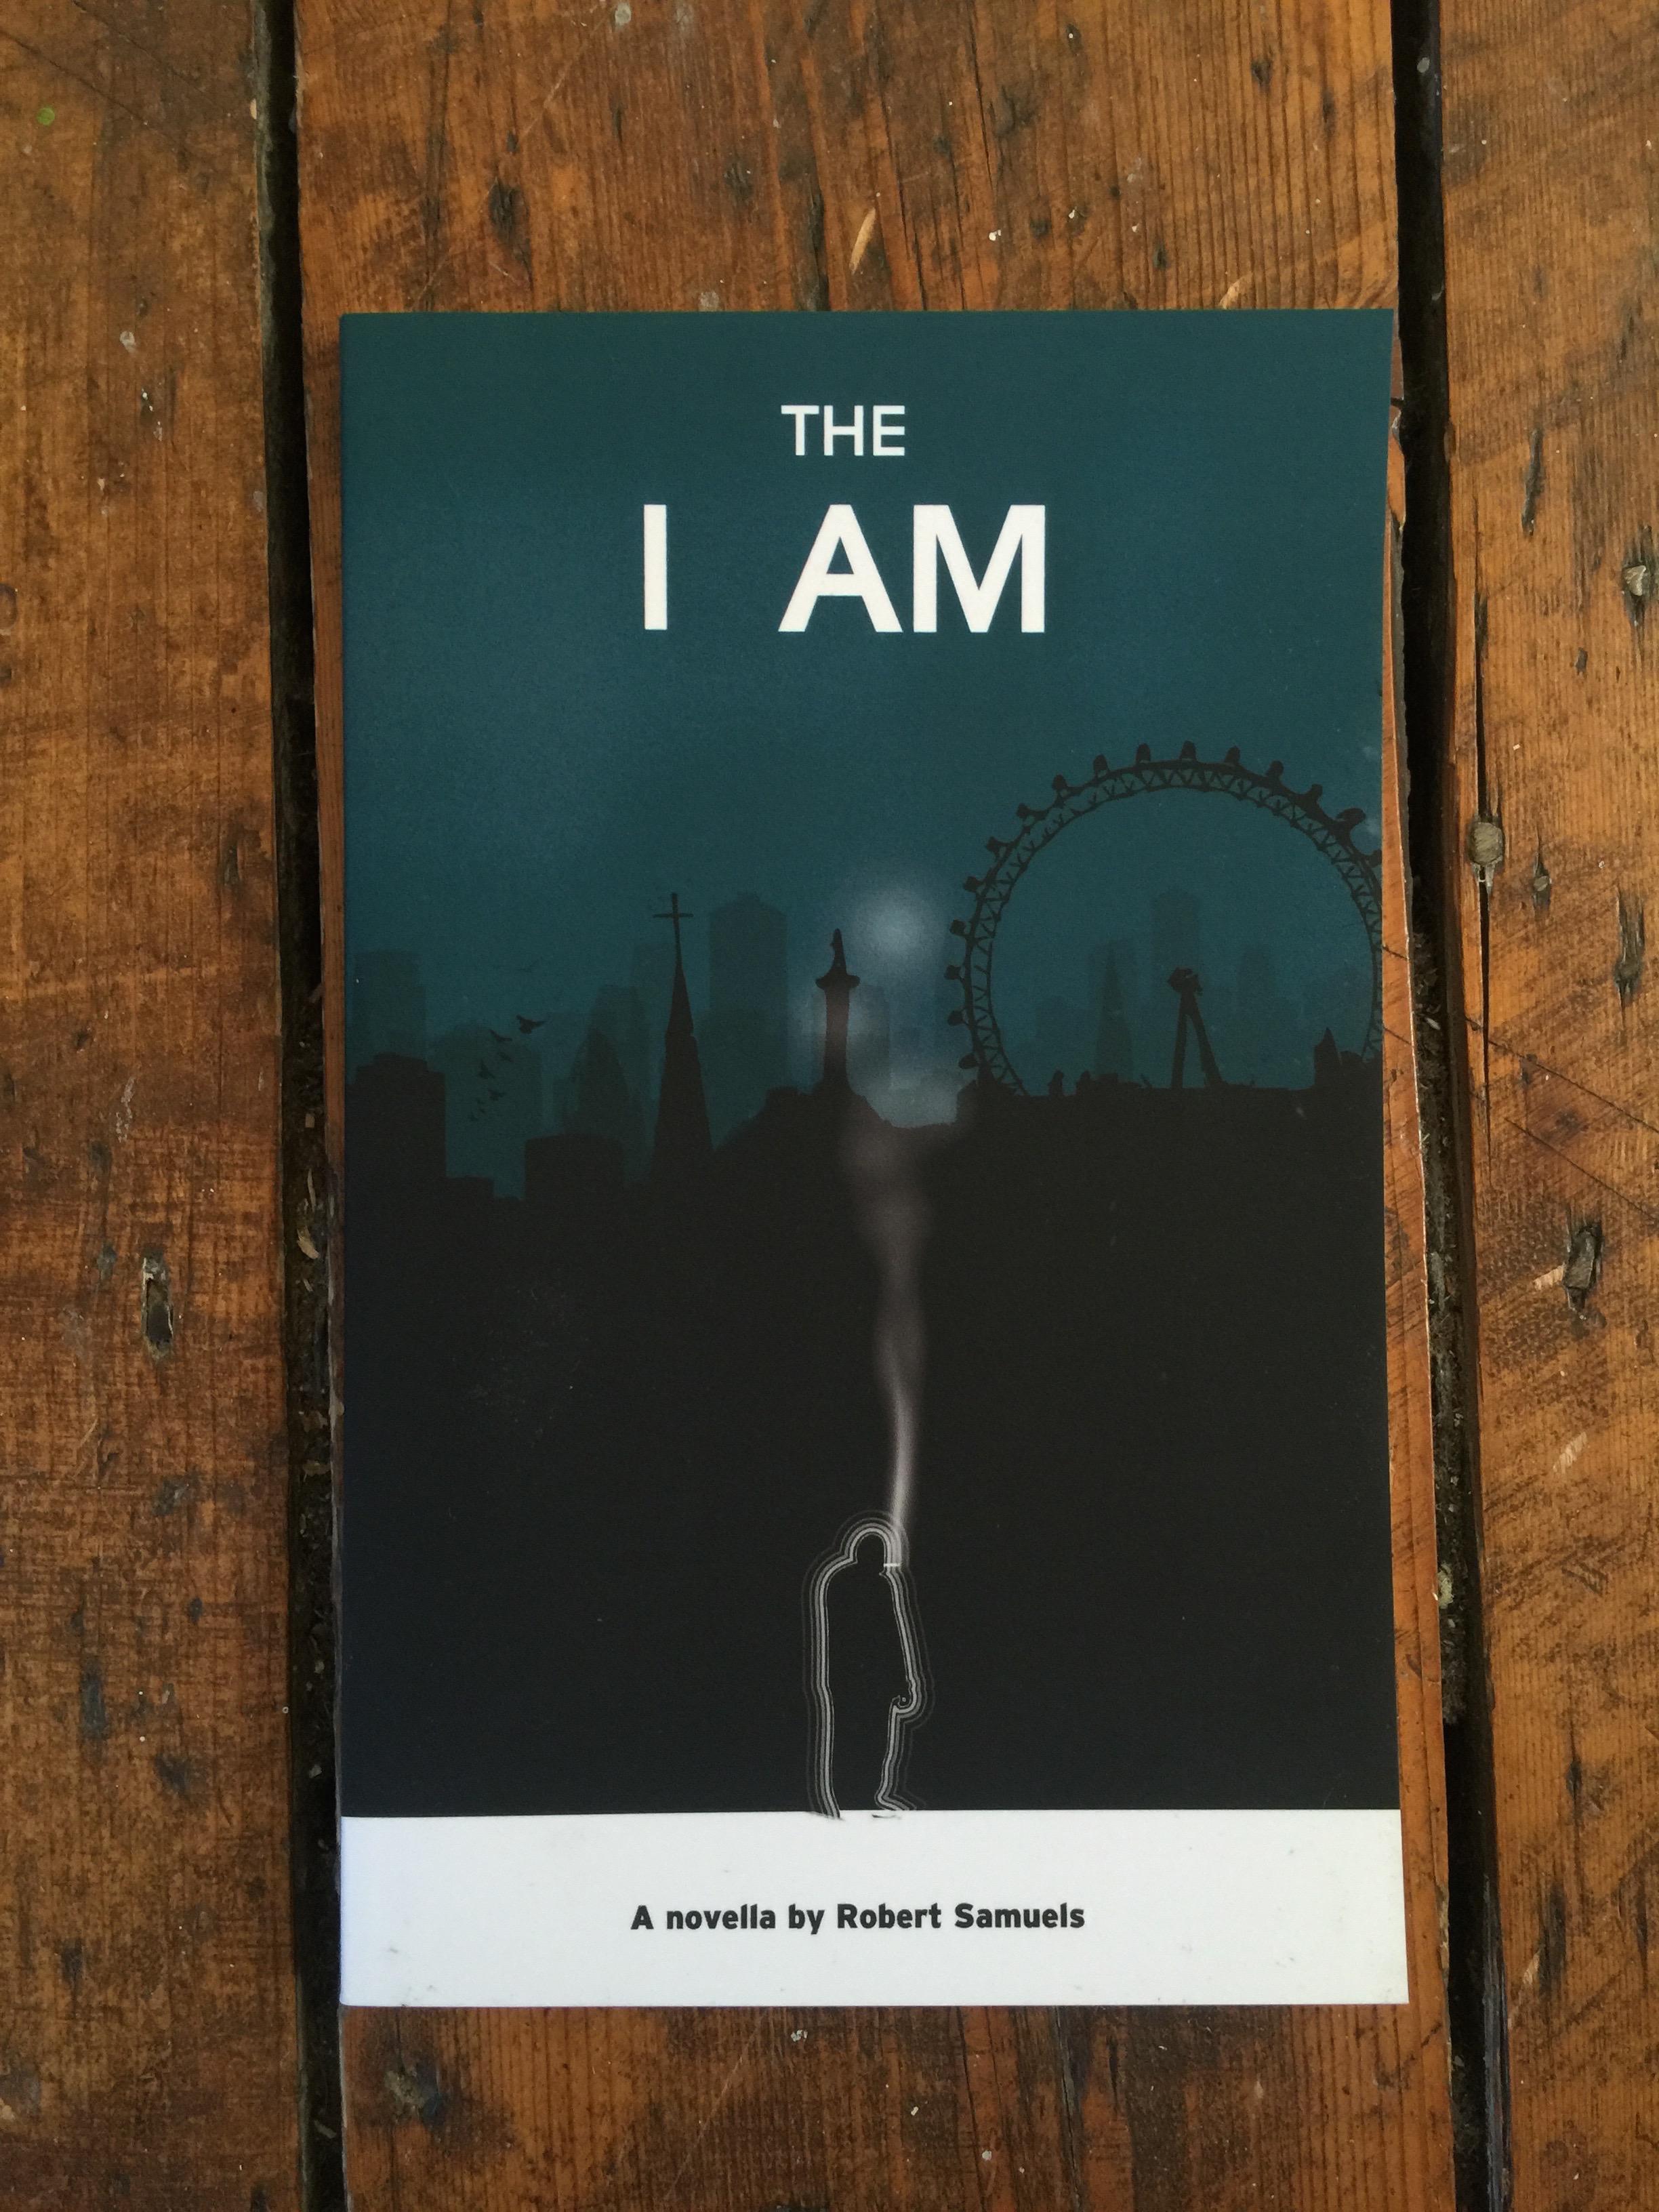 The I am novella